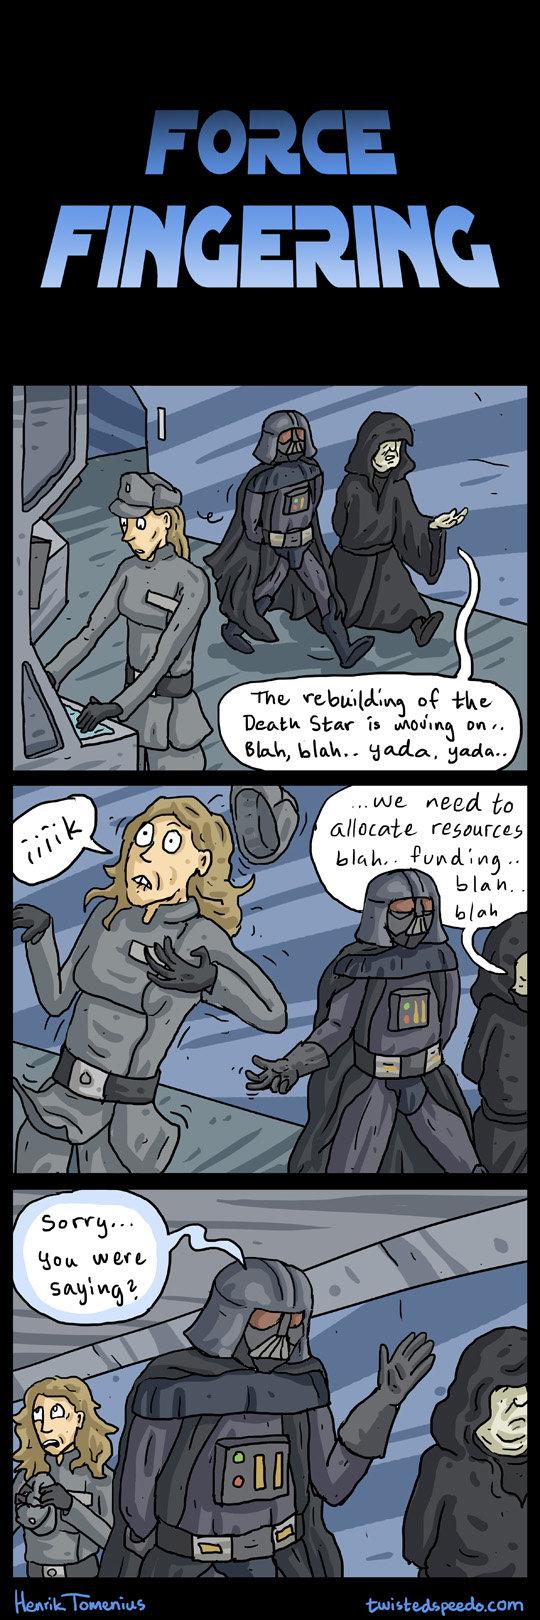 Oh Vader.... Check out more comics here twistedspeedo.com/. Elias] ! -thy. More like Darth Invader vaders a Pimp